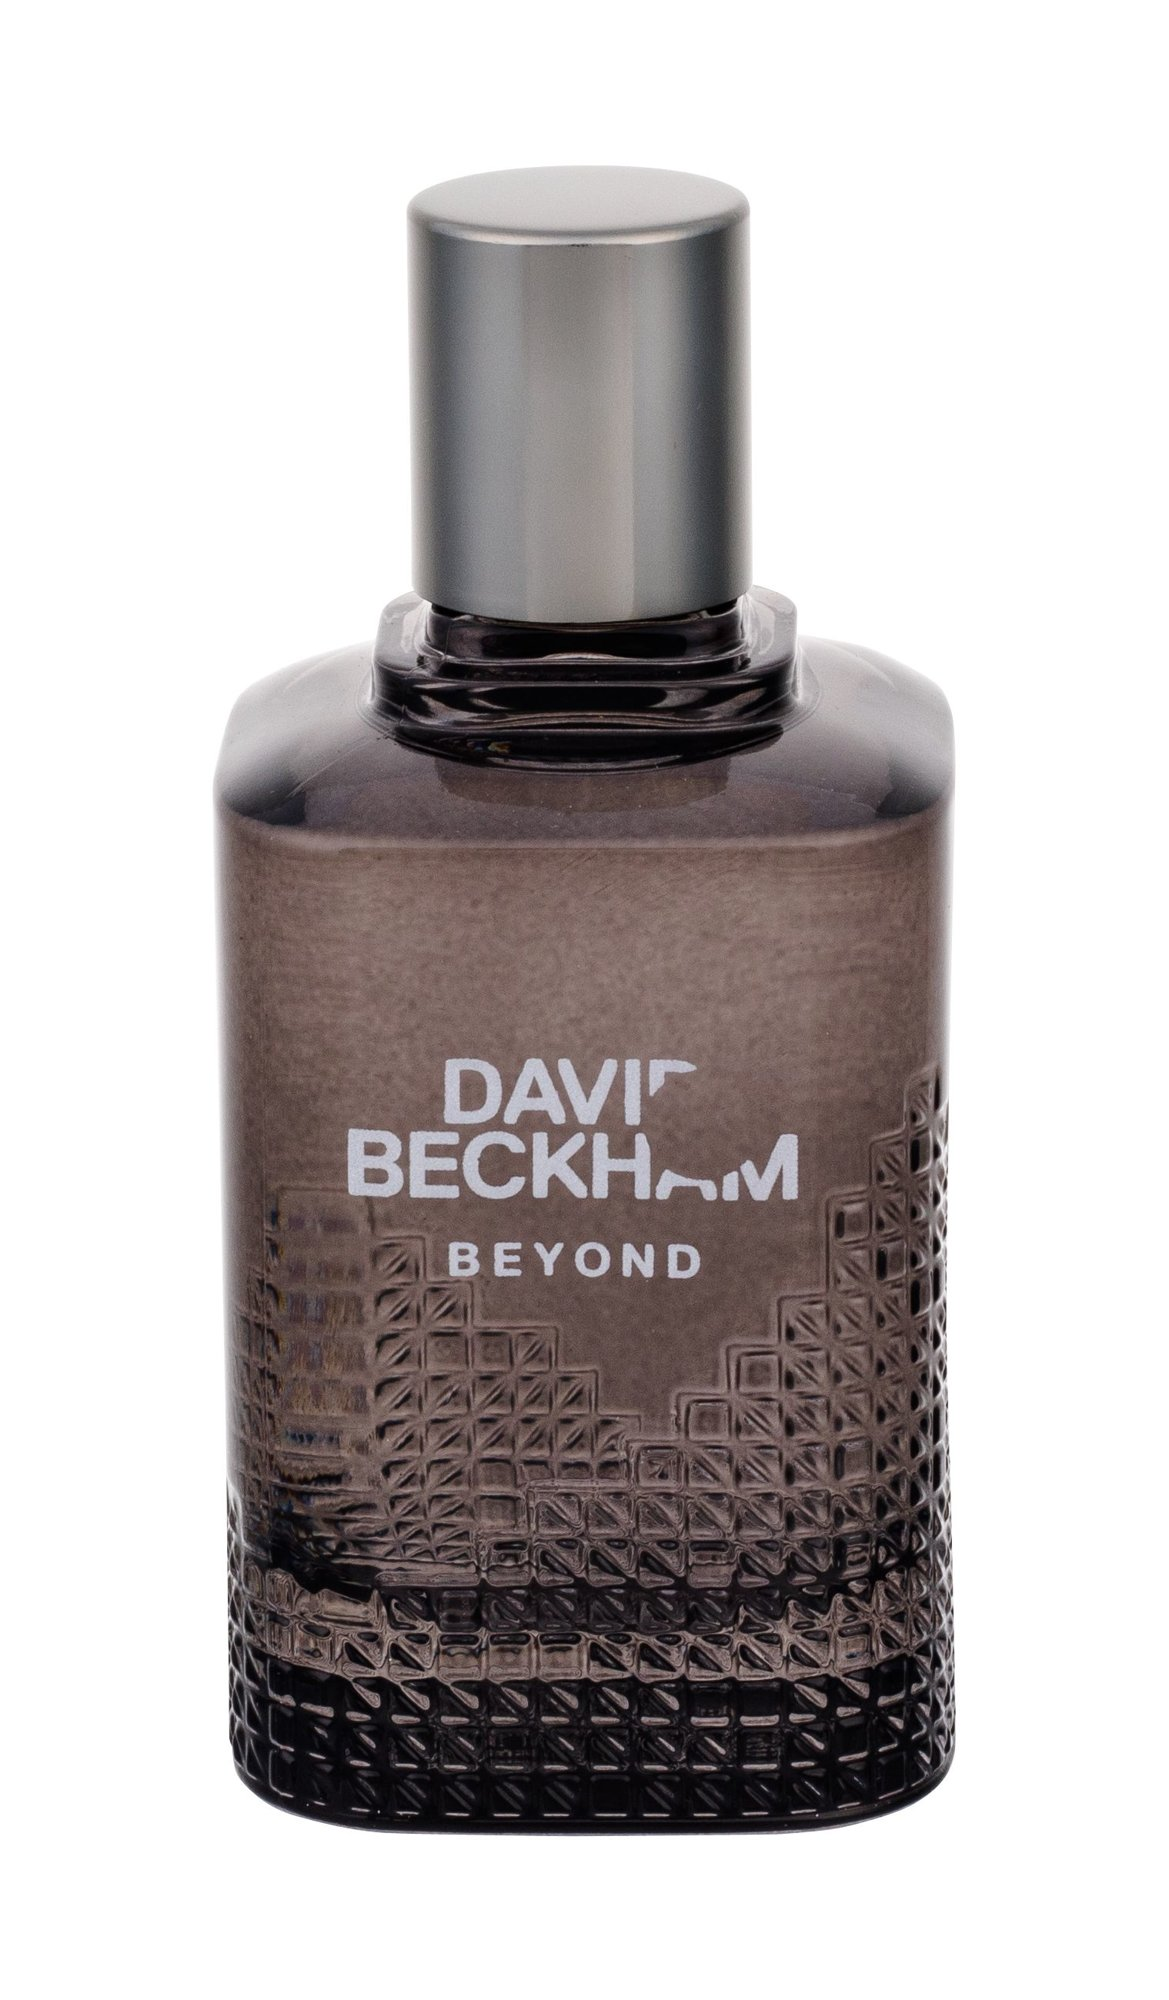 David Beckham Beyond Aftershave 60ml